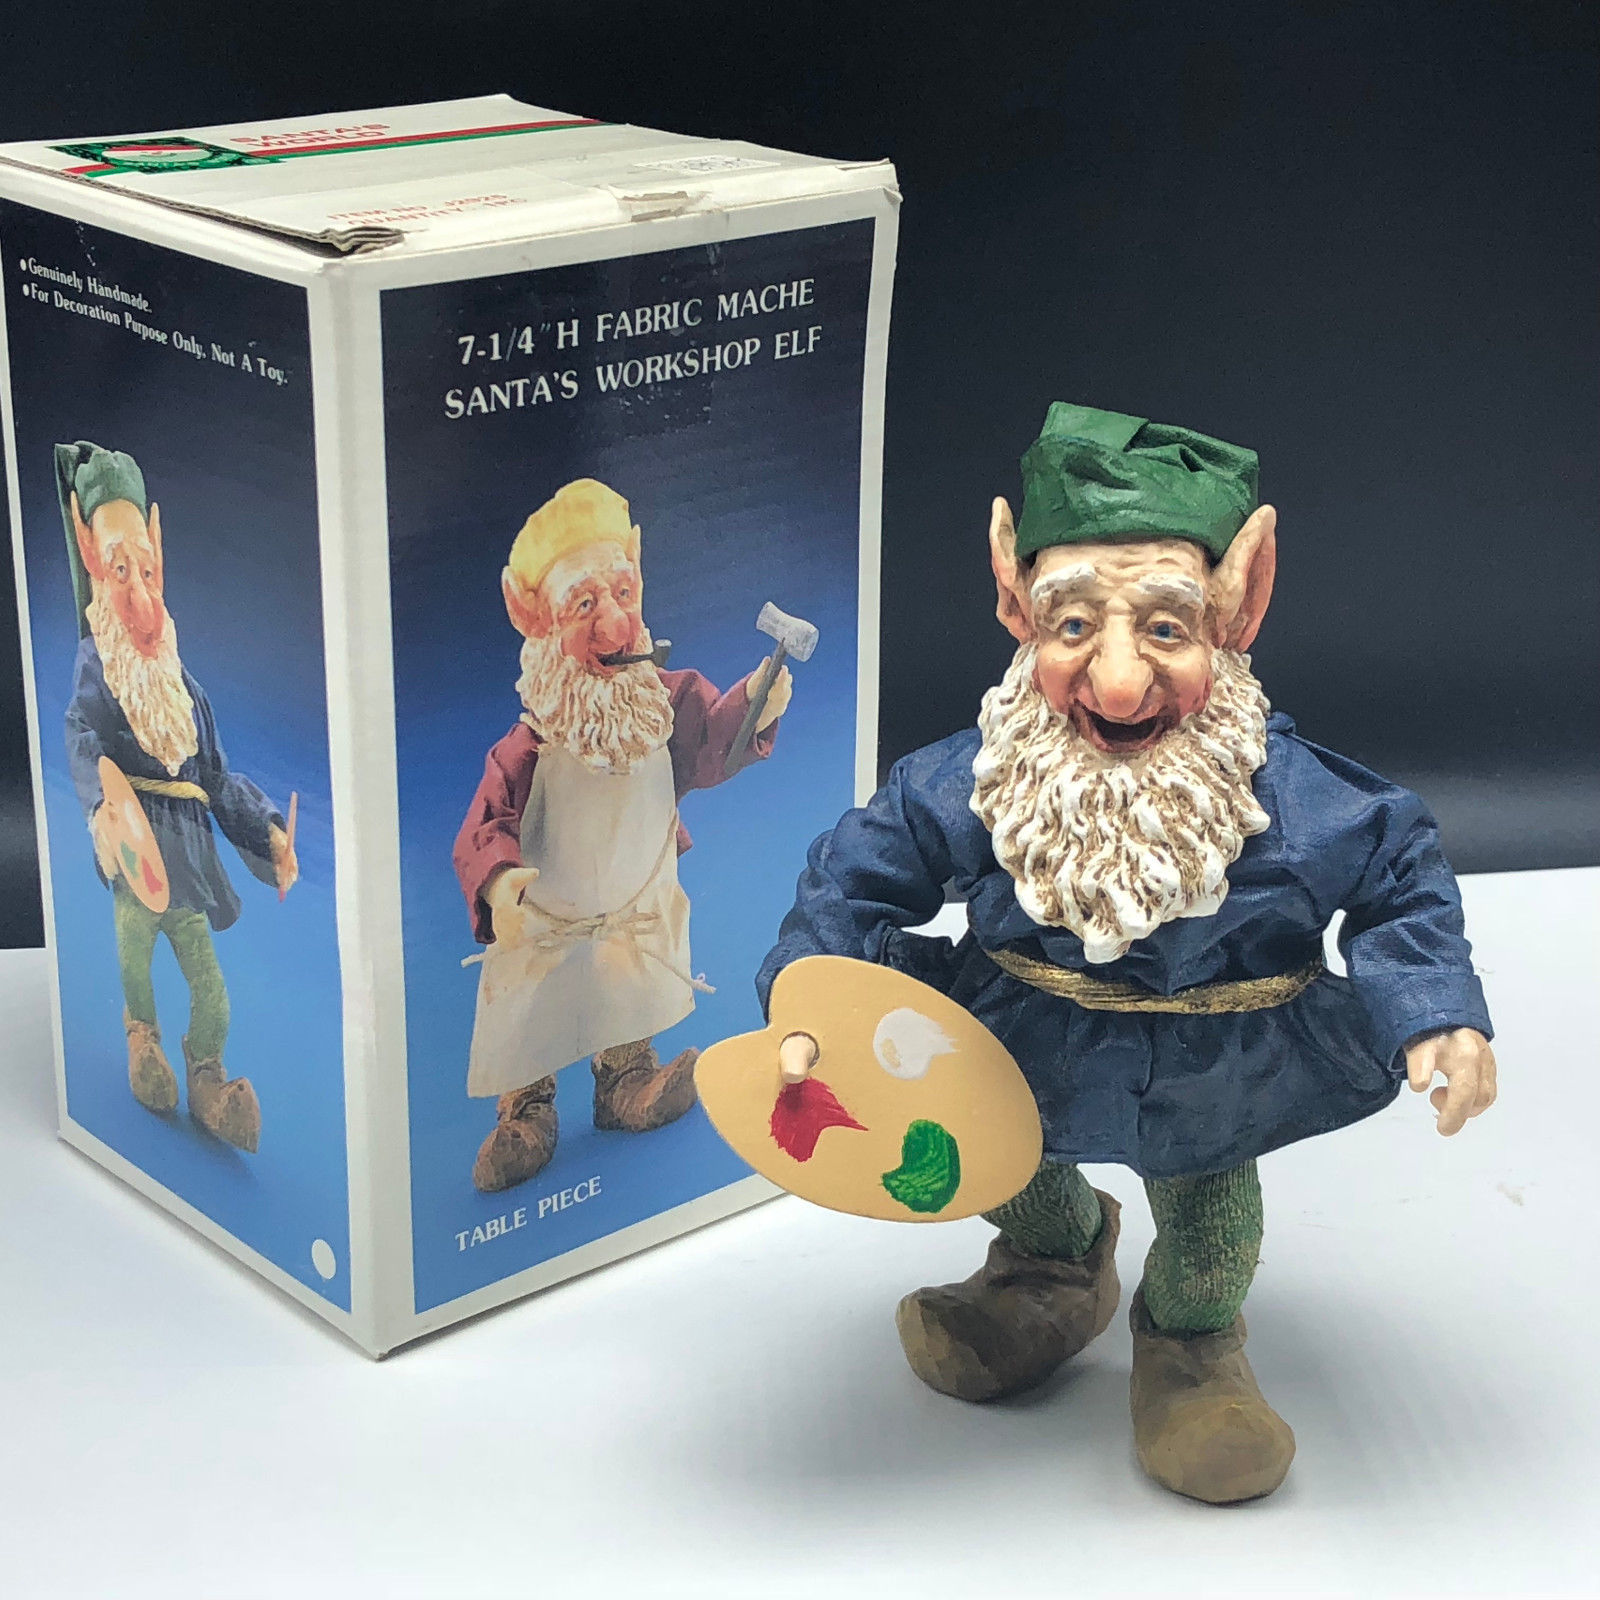 629feced15708 Kurt Adler Santa s World Workshop Elf and 50 similar items. S l1600